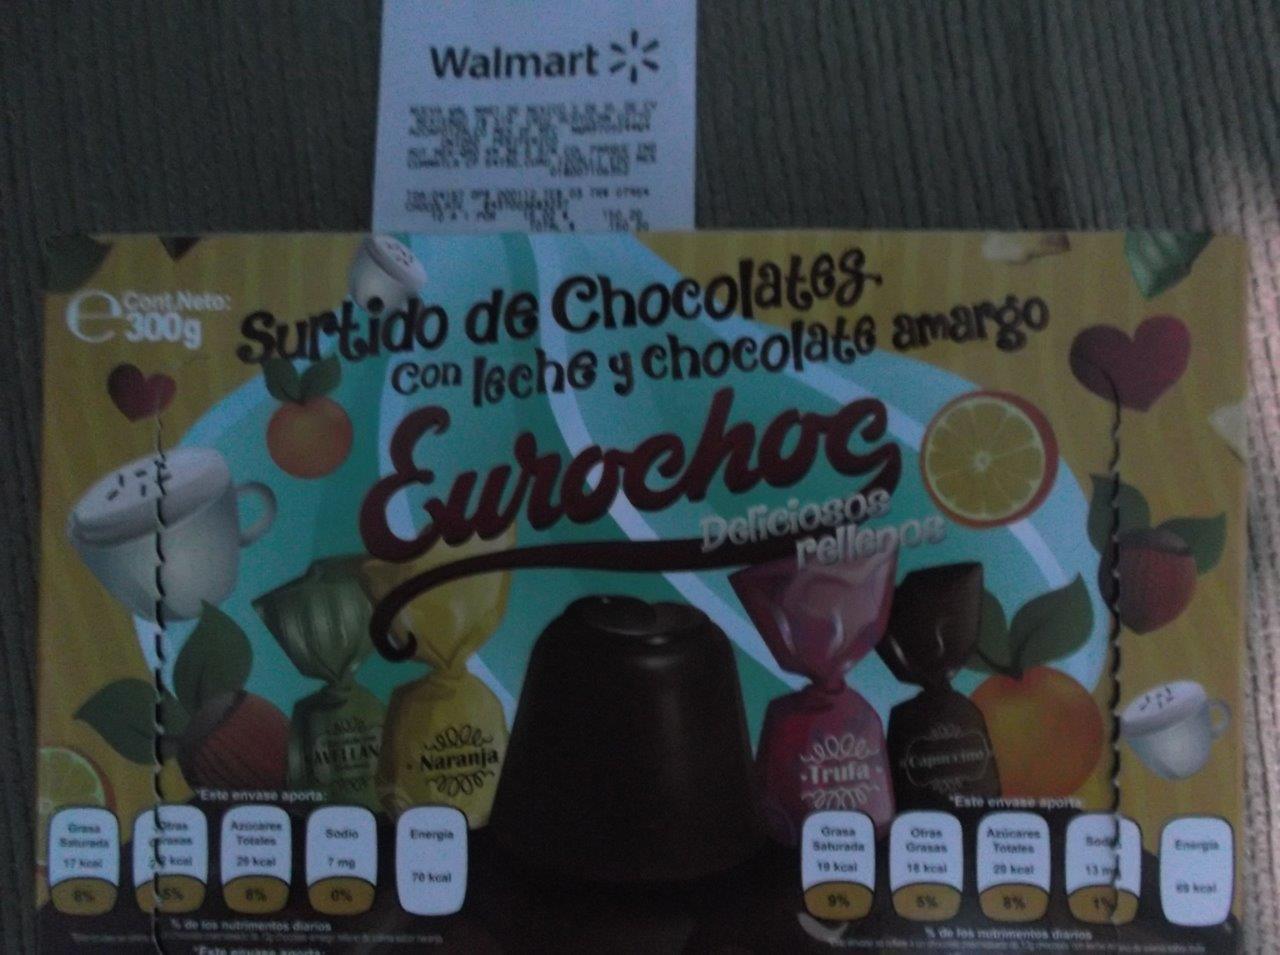 Walmart Periferico Cuautitlán: Chocolates Eurochoc a $15.02